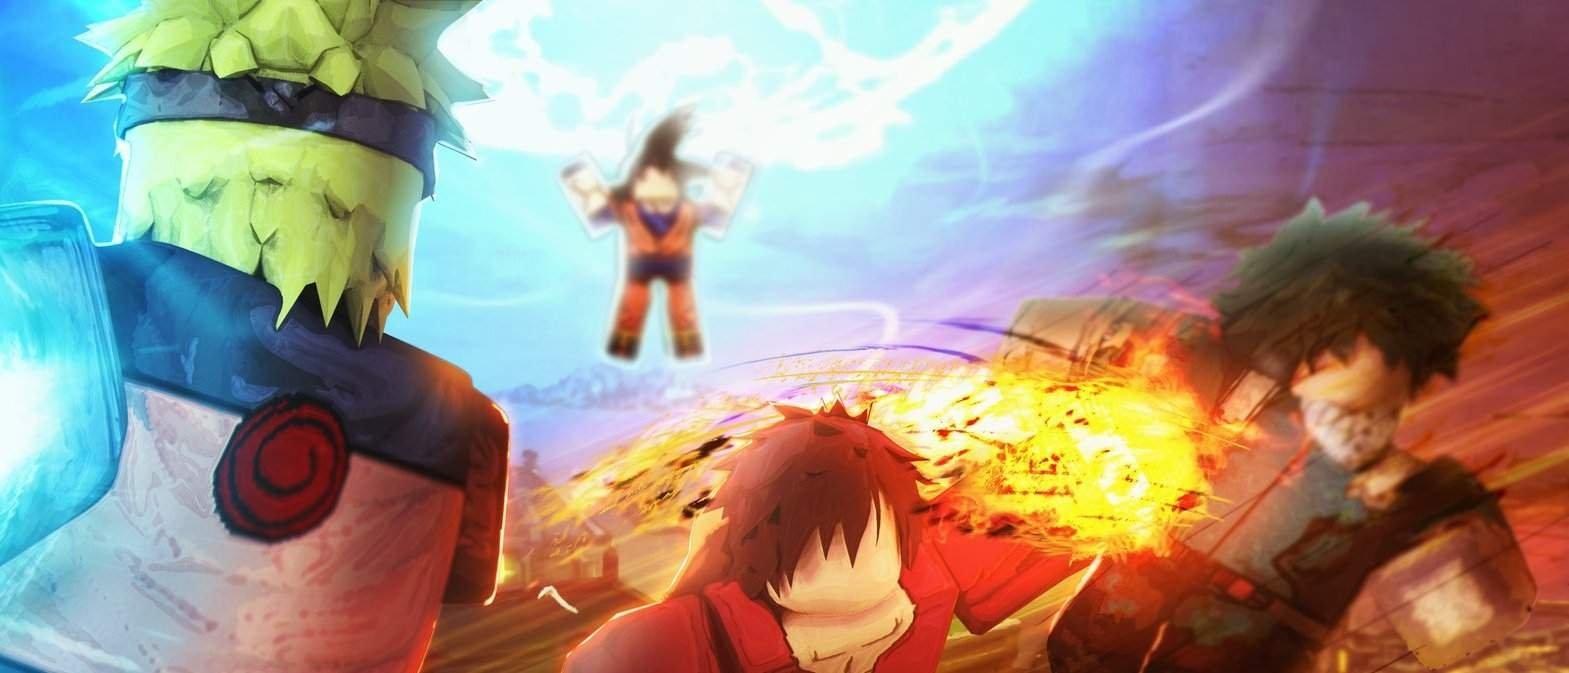 Roblox Anime Battle Simulator Codes July 2020